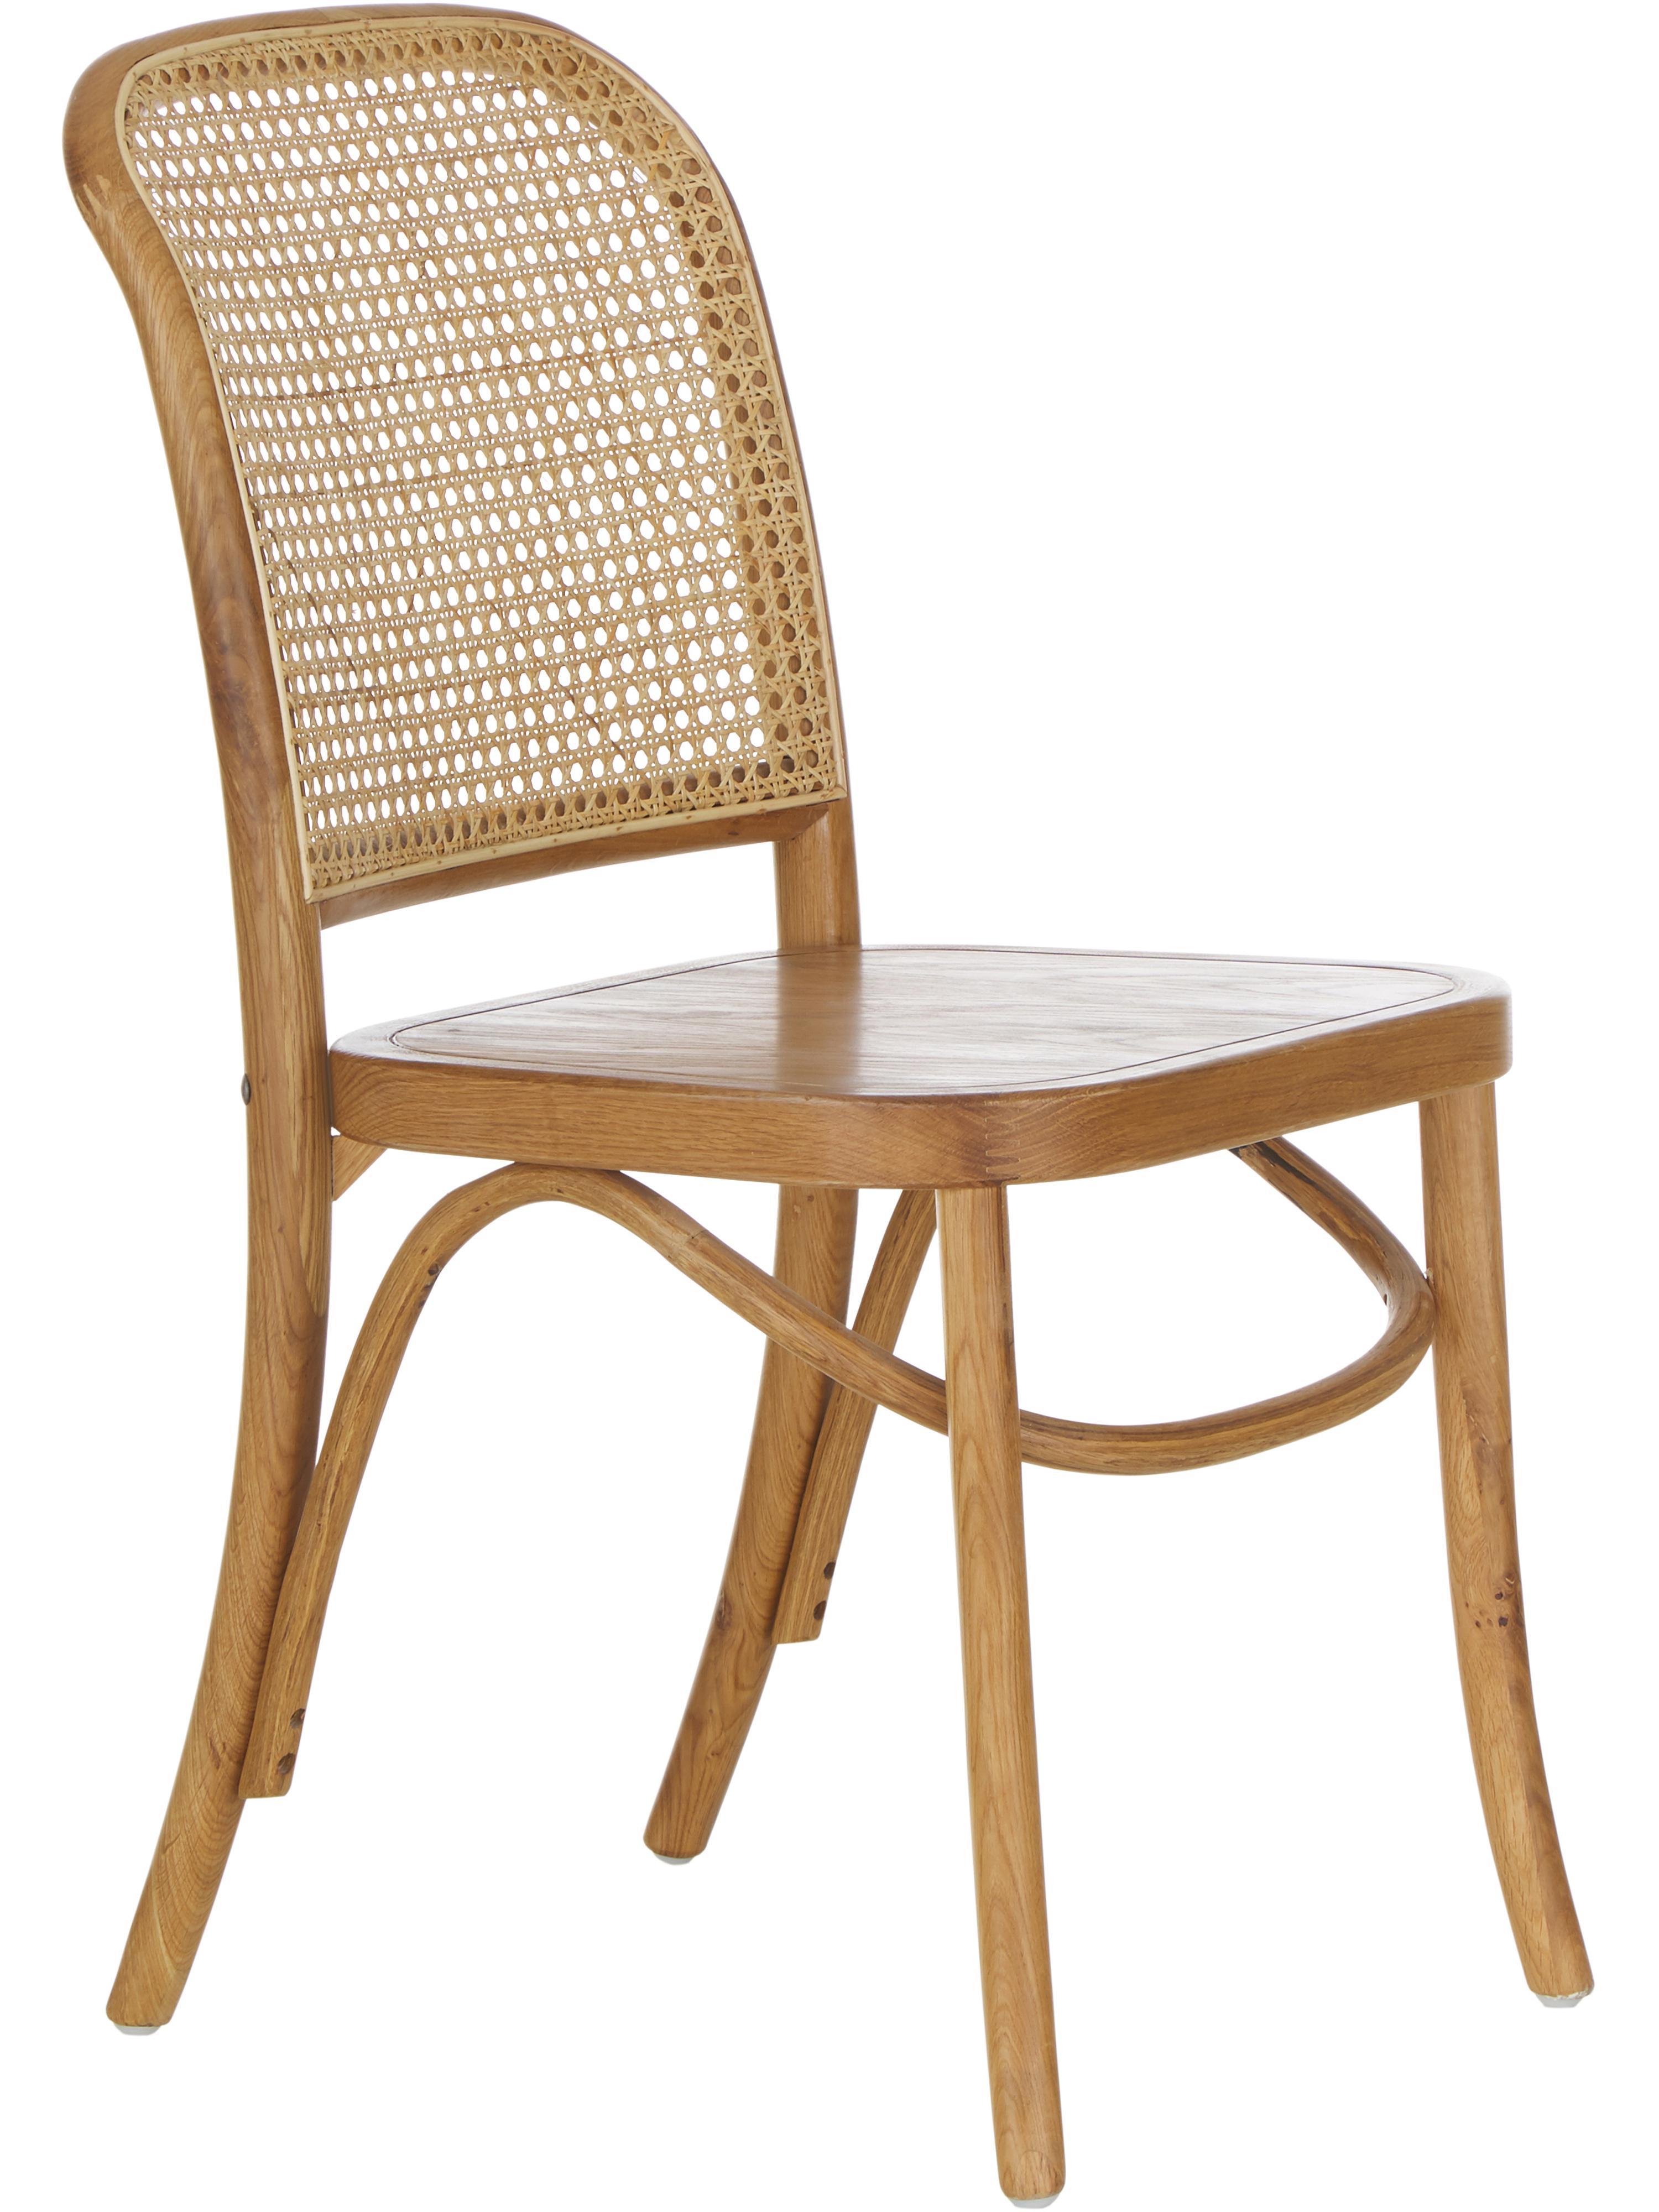 Stoel Franz met Weens vlechtwerk, Zitvlak: rotan, Frame: massief gelakt eikenhout, Zitvlak: rotankleurig. Frame: eikenhoutkleurig, B 48  x D 59 cm